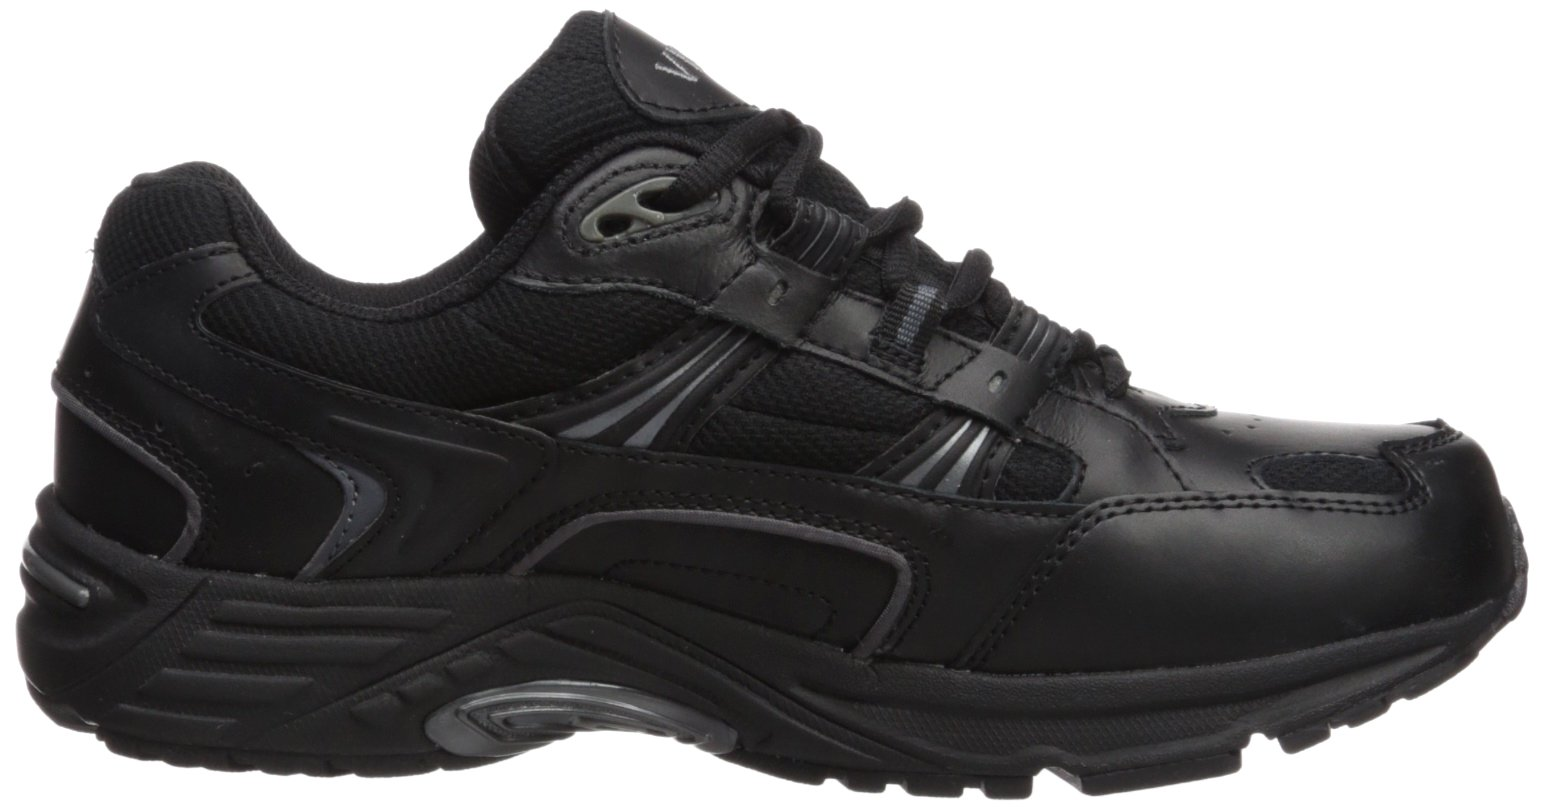 Vionic Women's Walker Classic Shoes, 8 B(M) US, Black by Vionic (Image #7)